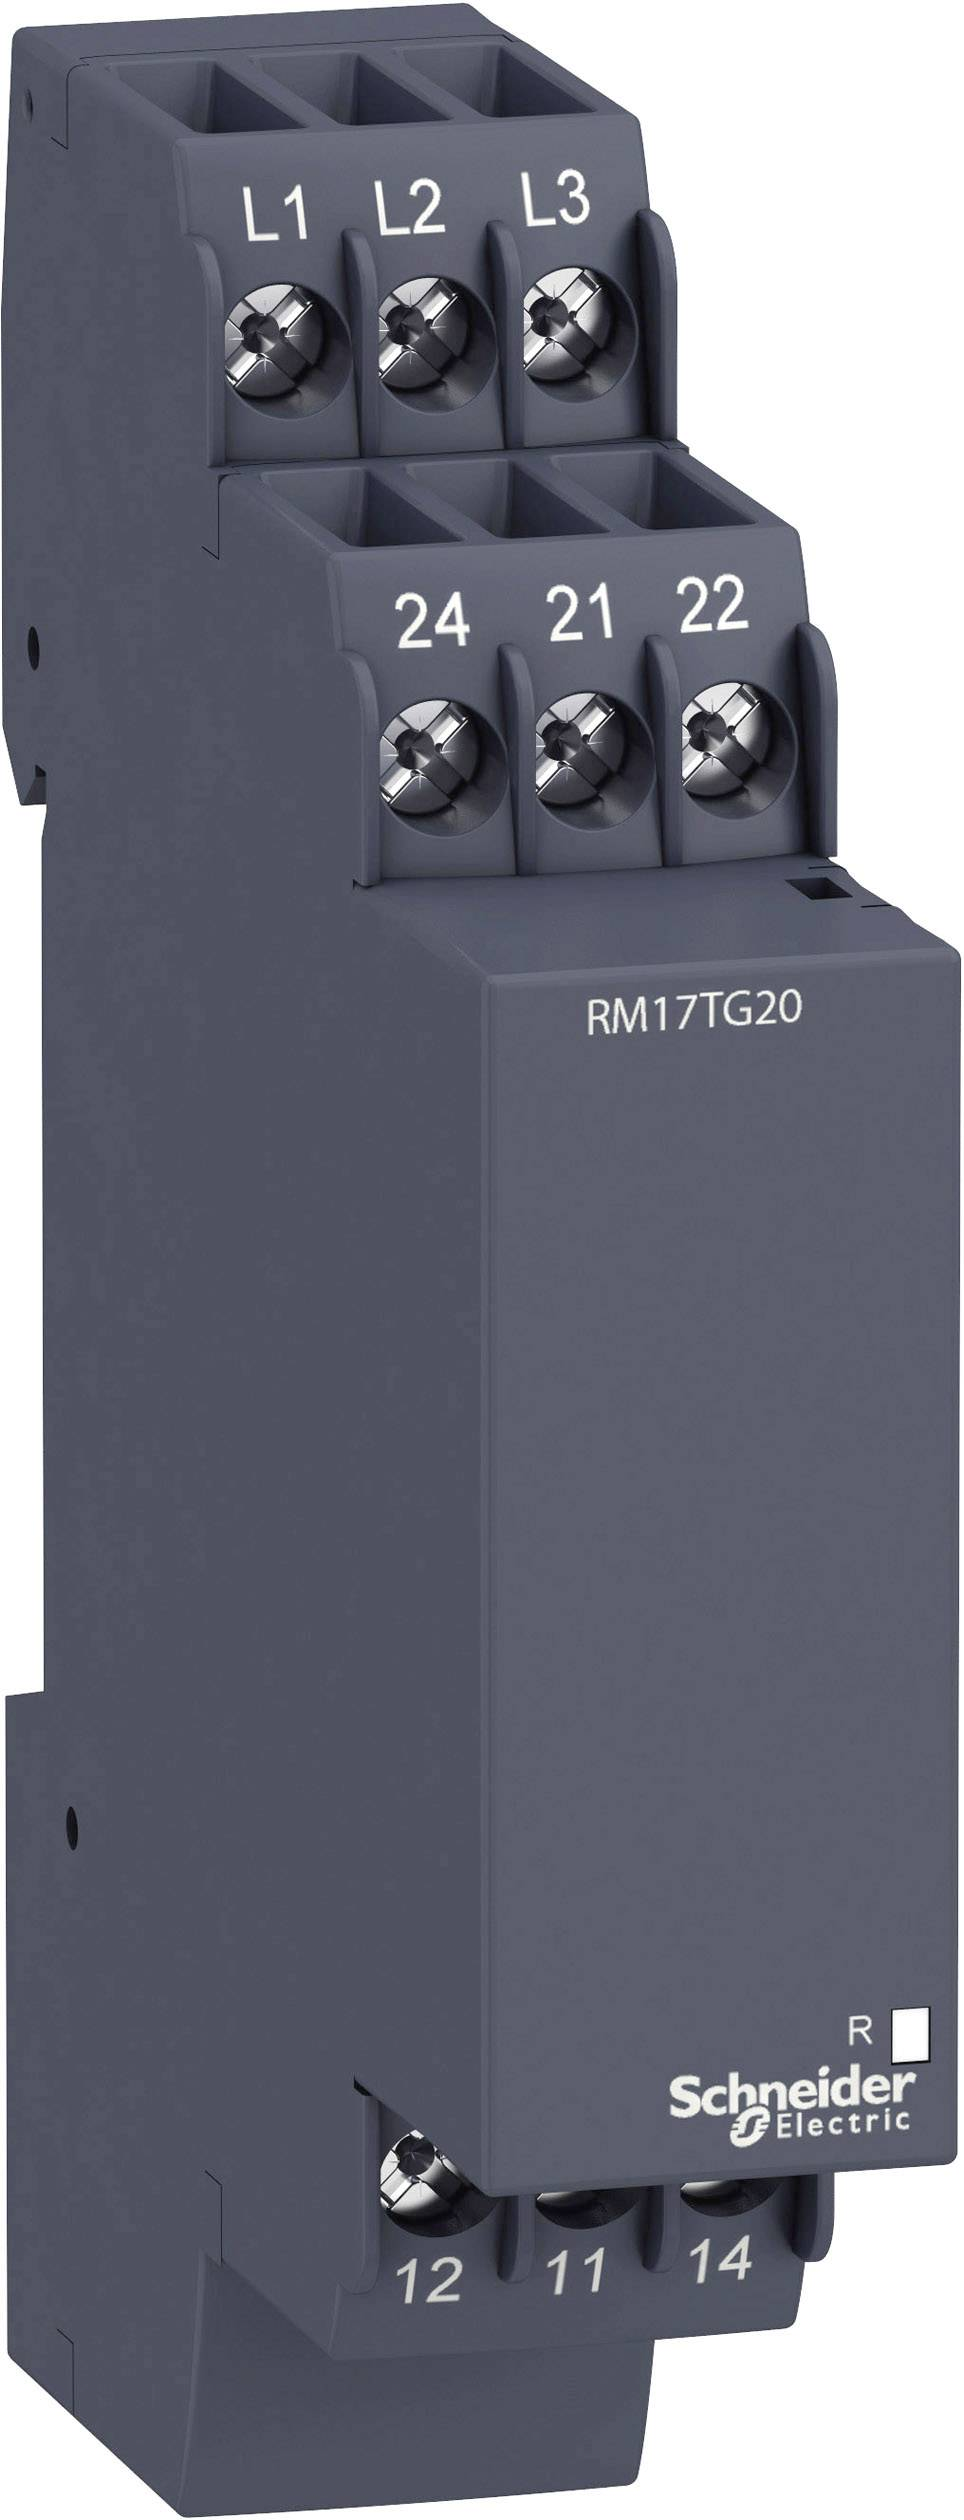 Monitorovací relé Schneider Electric RM17TG20 RM17TG20